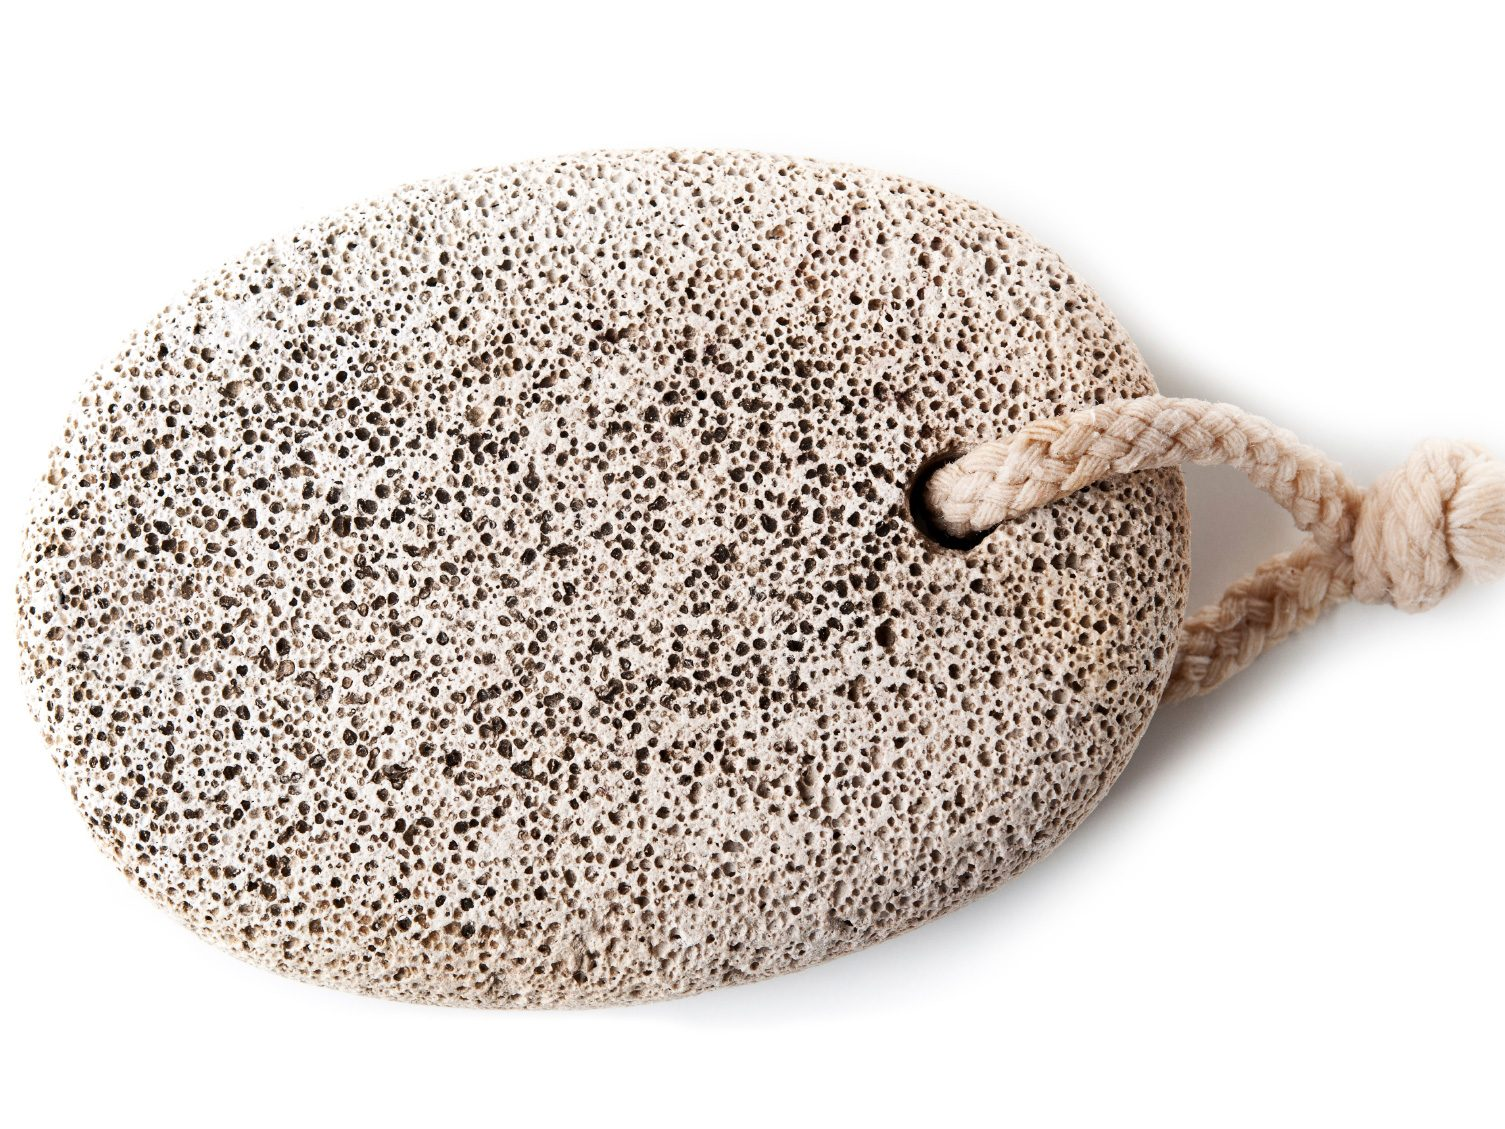 Grab a Pumice Stone